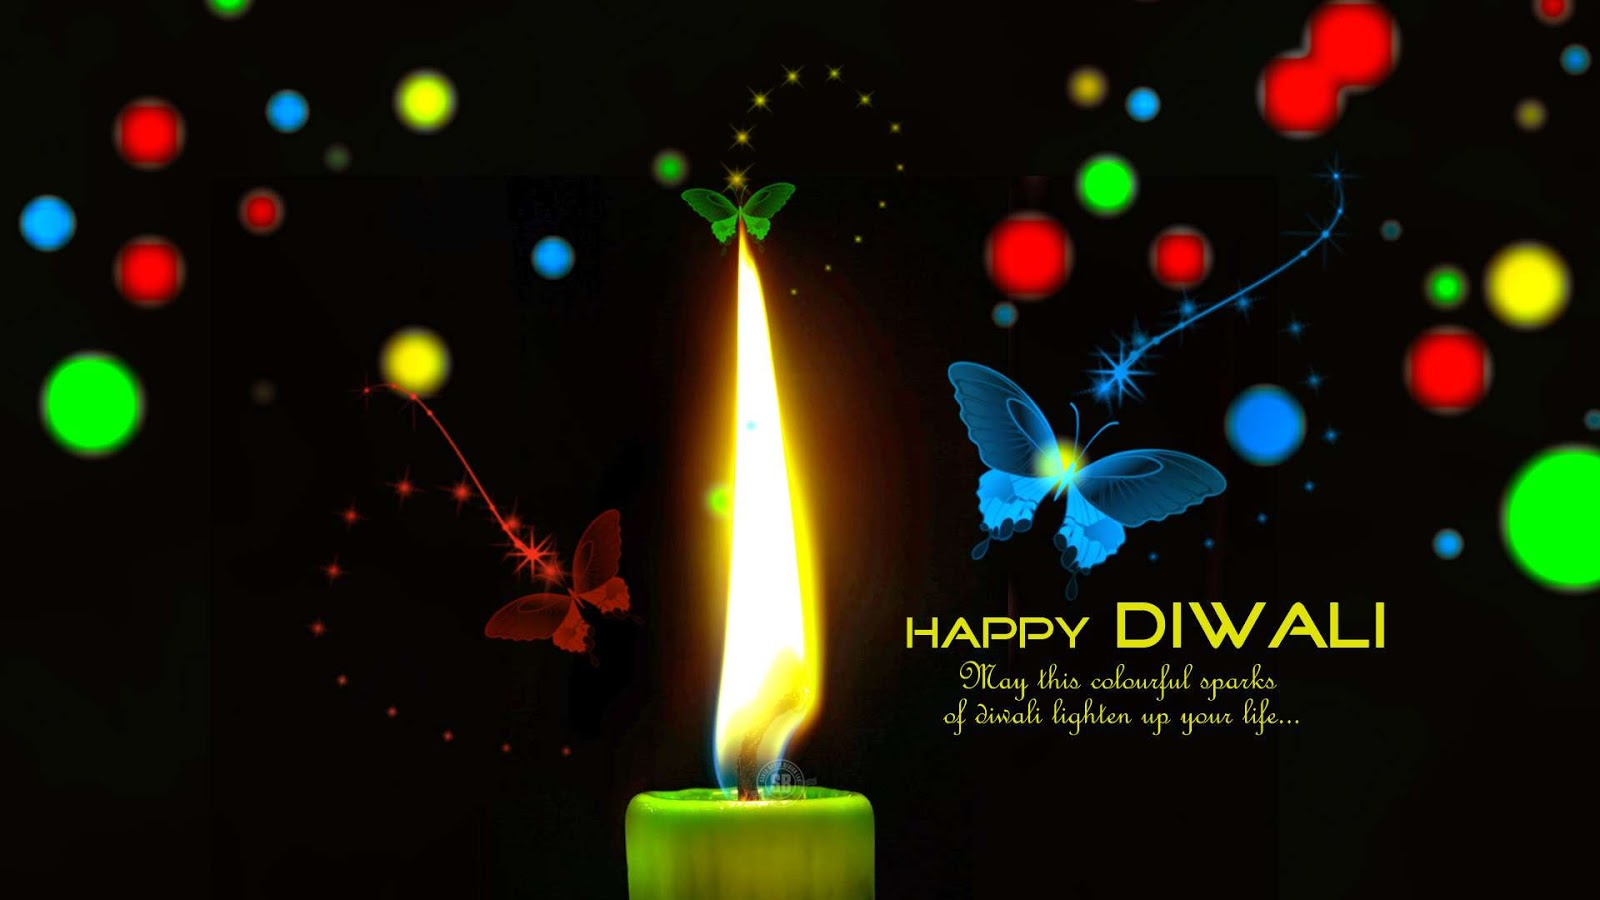 Happy diwali 2016 greeting cards diwali wishes quotes diwali deepavali 2016 photos for desktop m4hsunfo